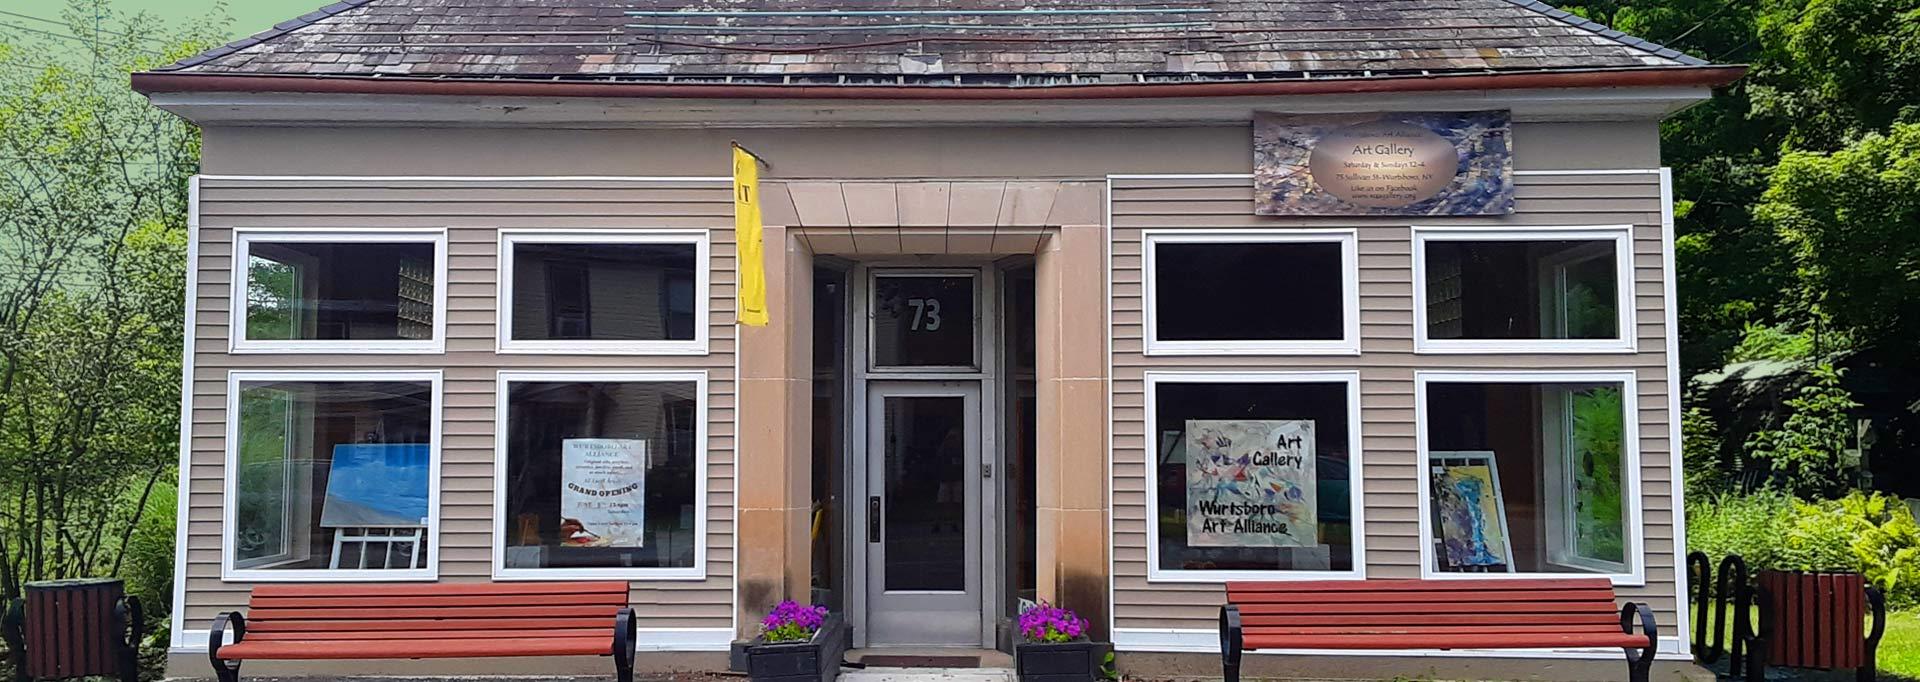 Wurtsboro Art Alliance 1